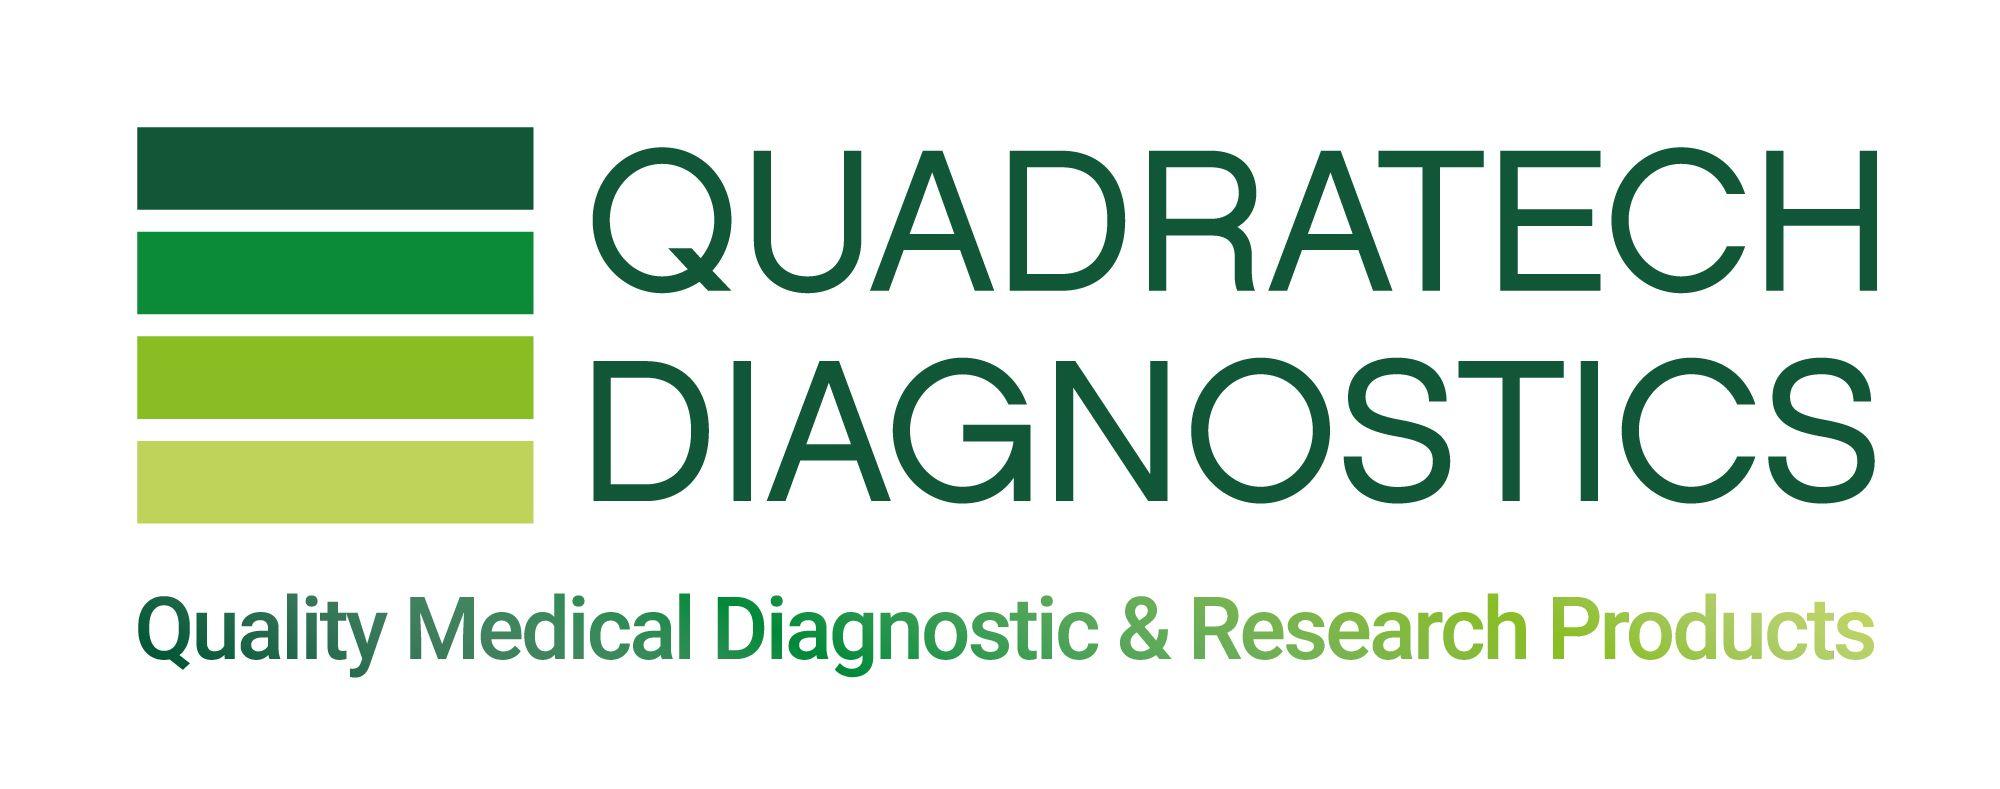 QUADRATECH DIAGNOSTICS LAUNCHES VETERINARY PRODUCT RANGE